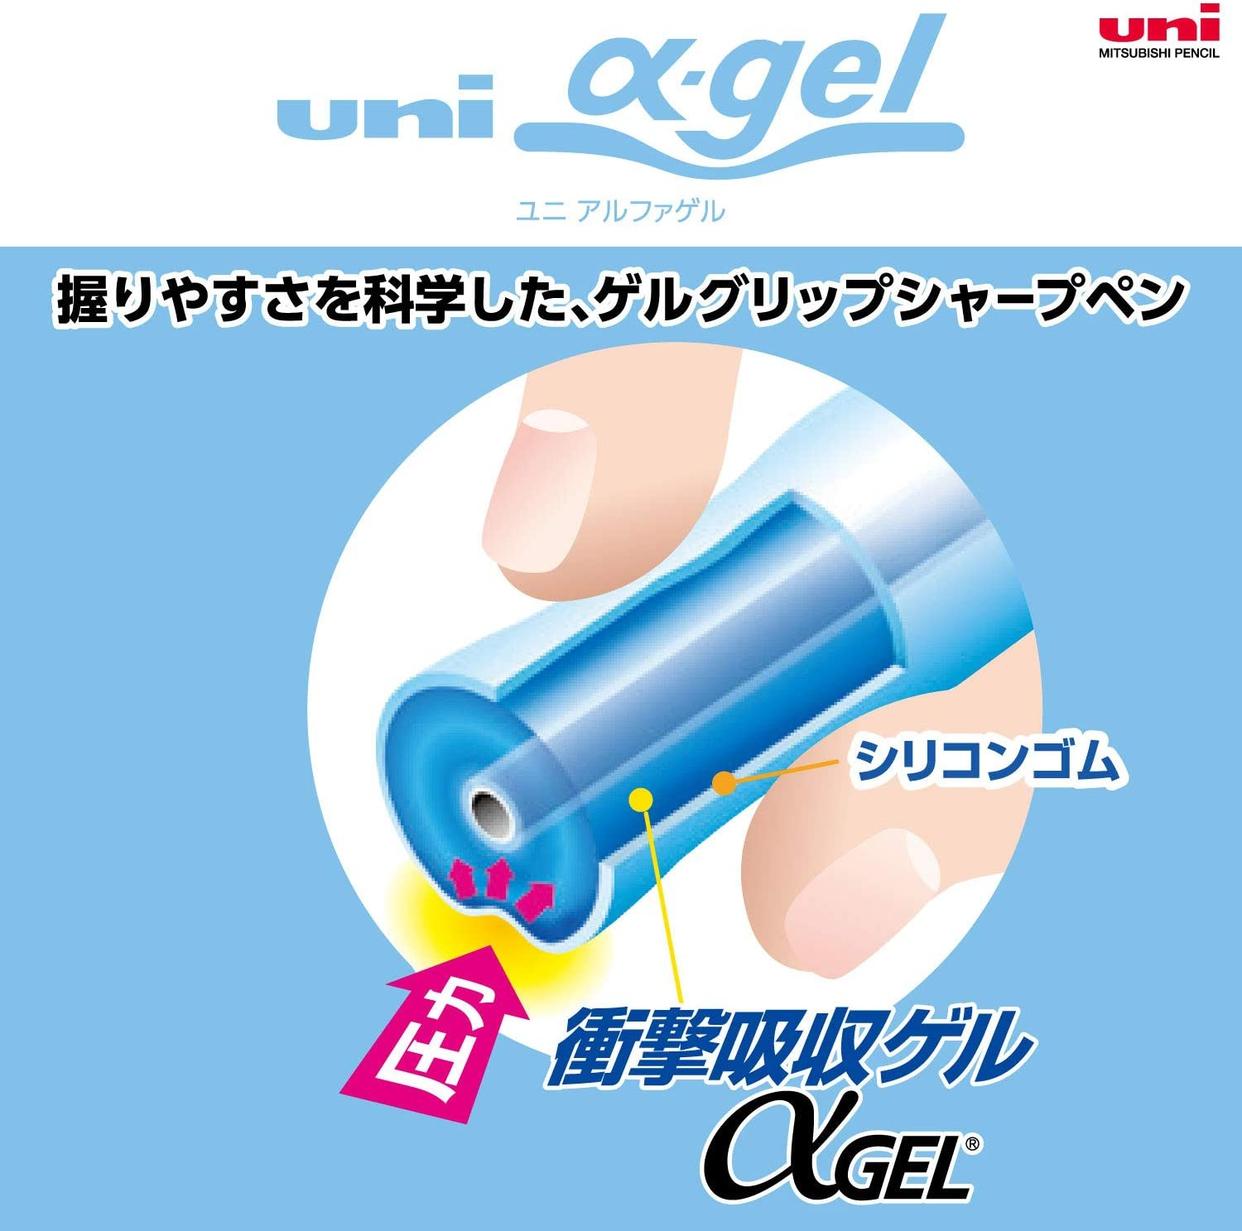 uni α-gel(ユニ アルファゲル) スリムタイプ:かため M5-809GG 1Pの商品画像6